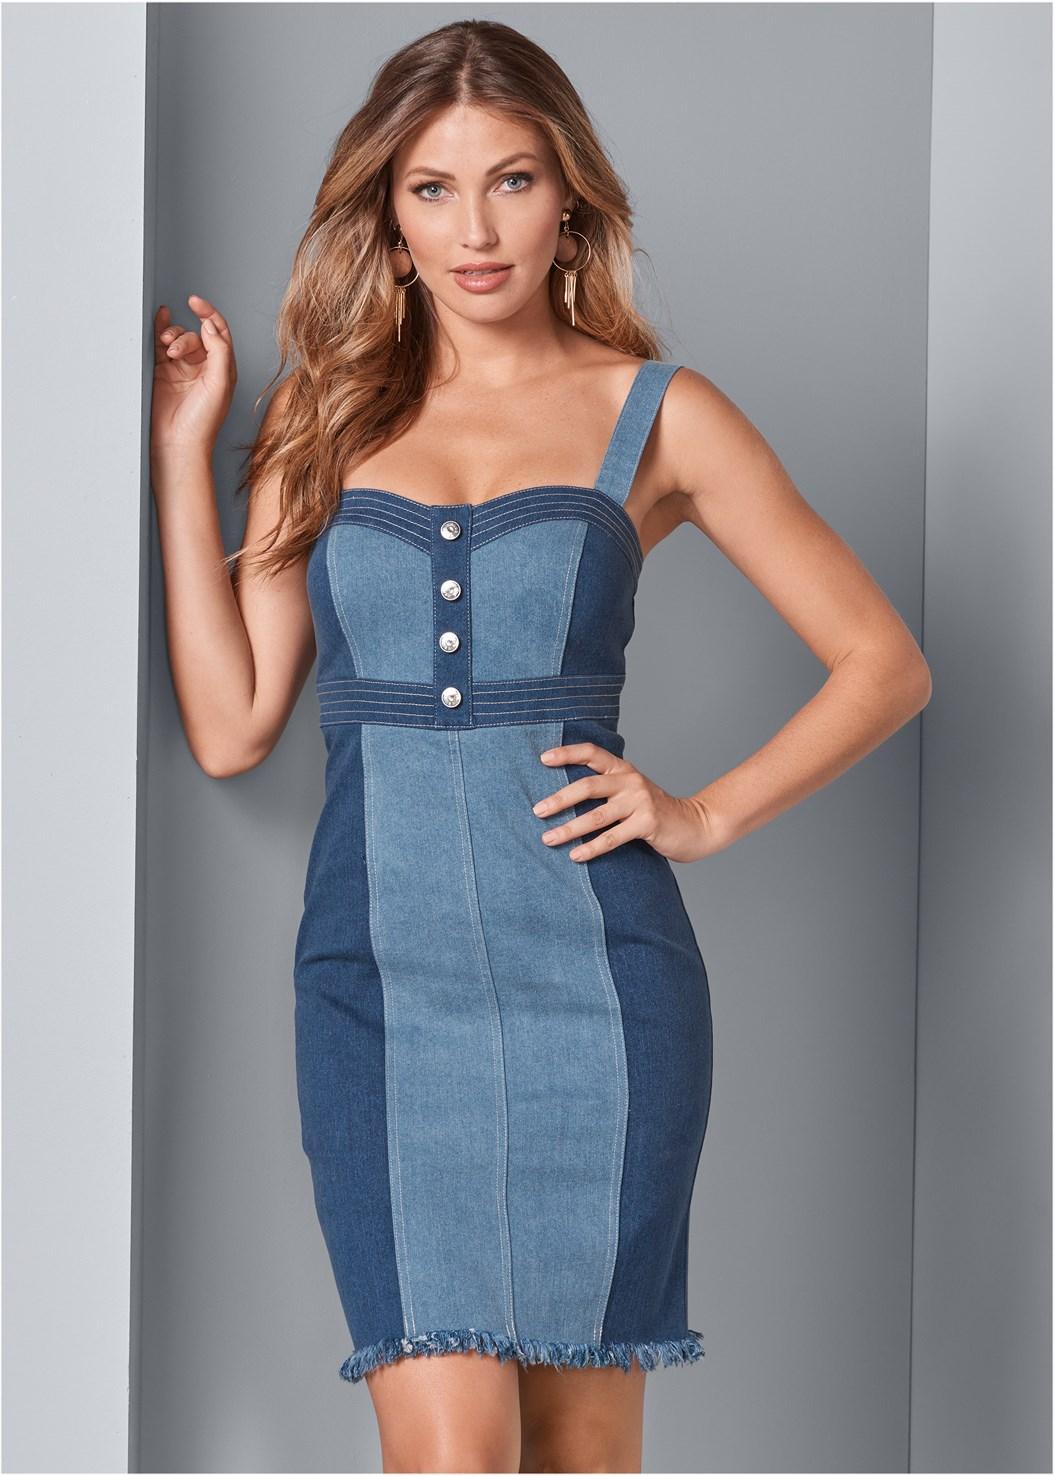 Button Detail Denim Dress,Raffia Detail Heels,Denim Handbag